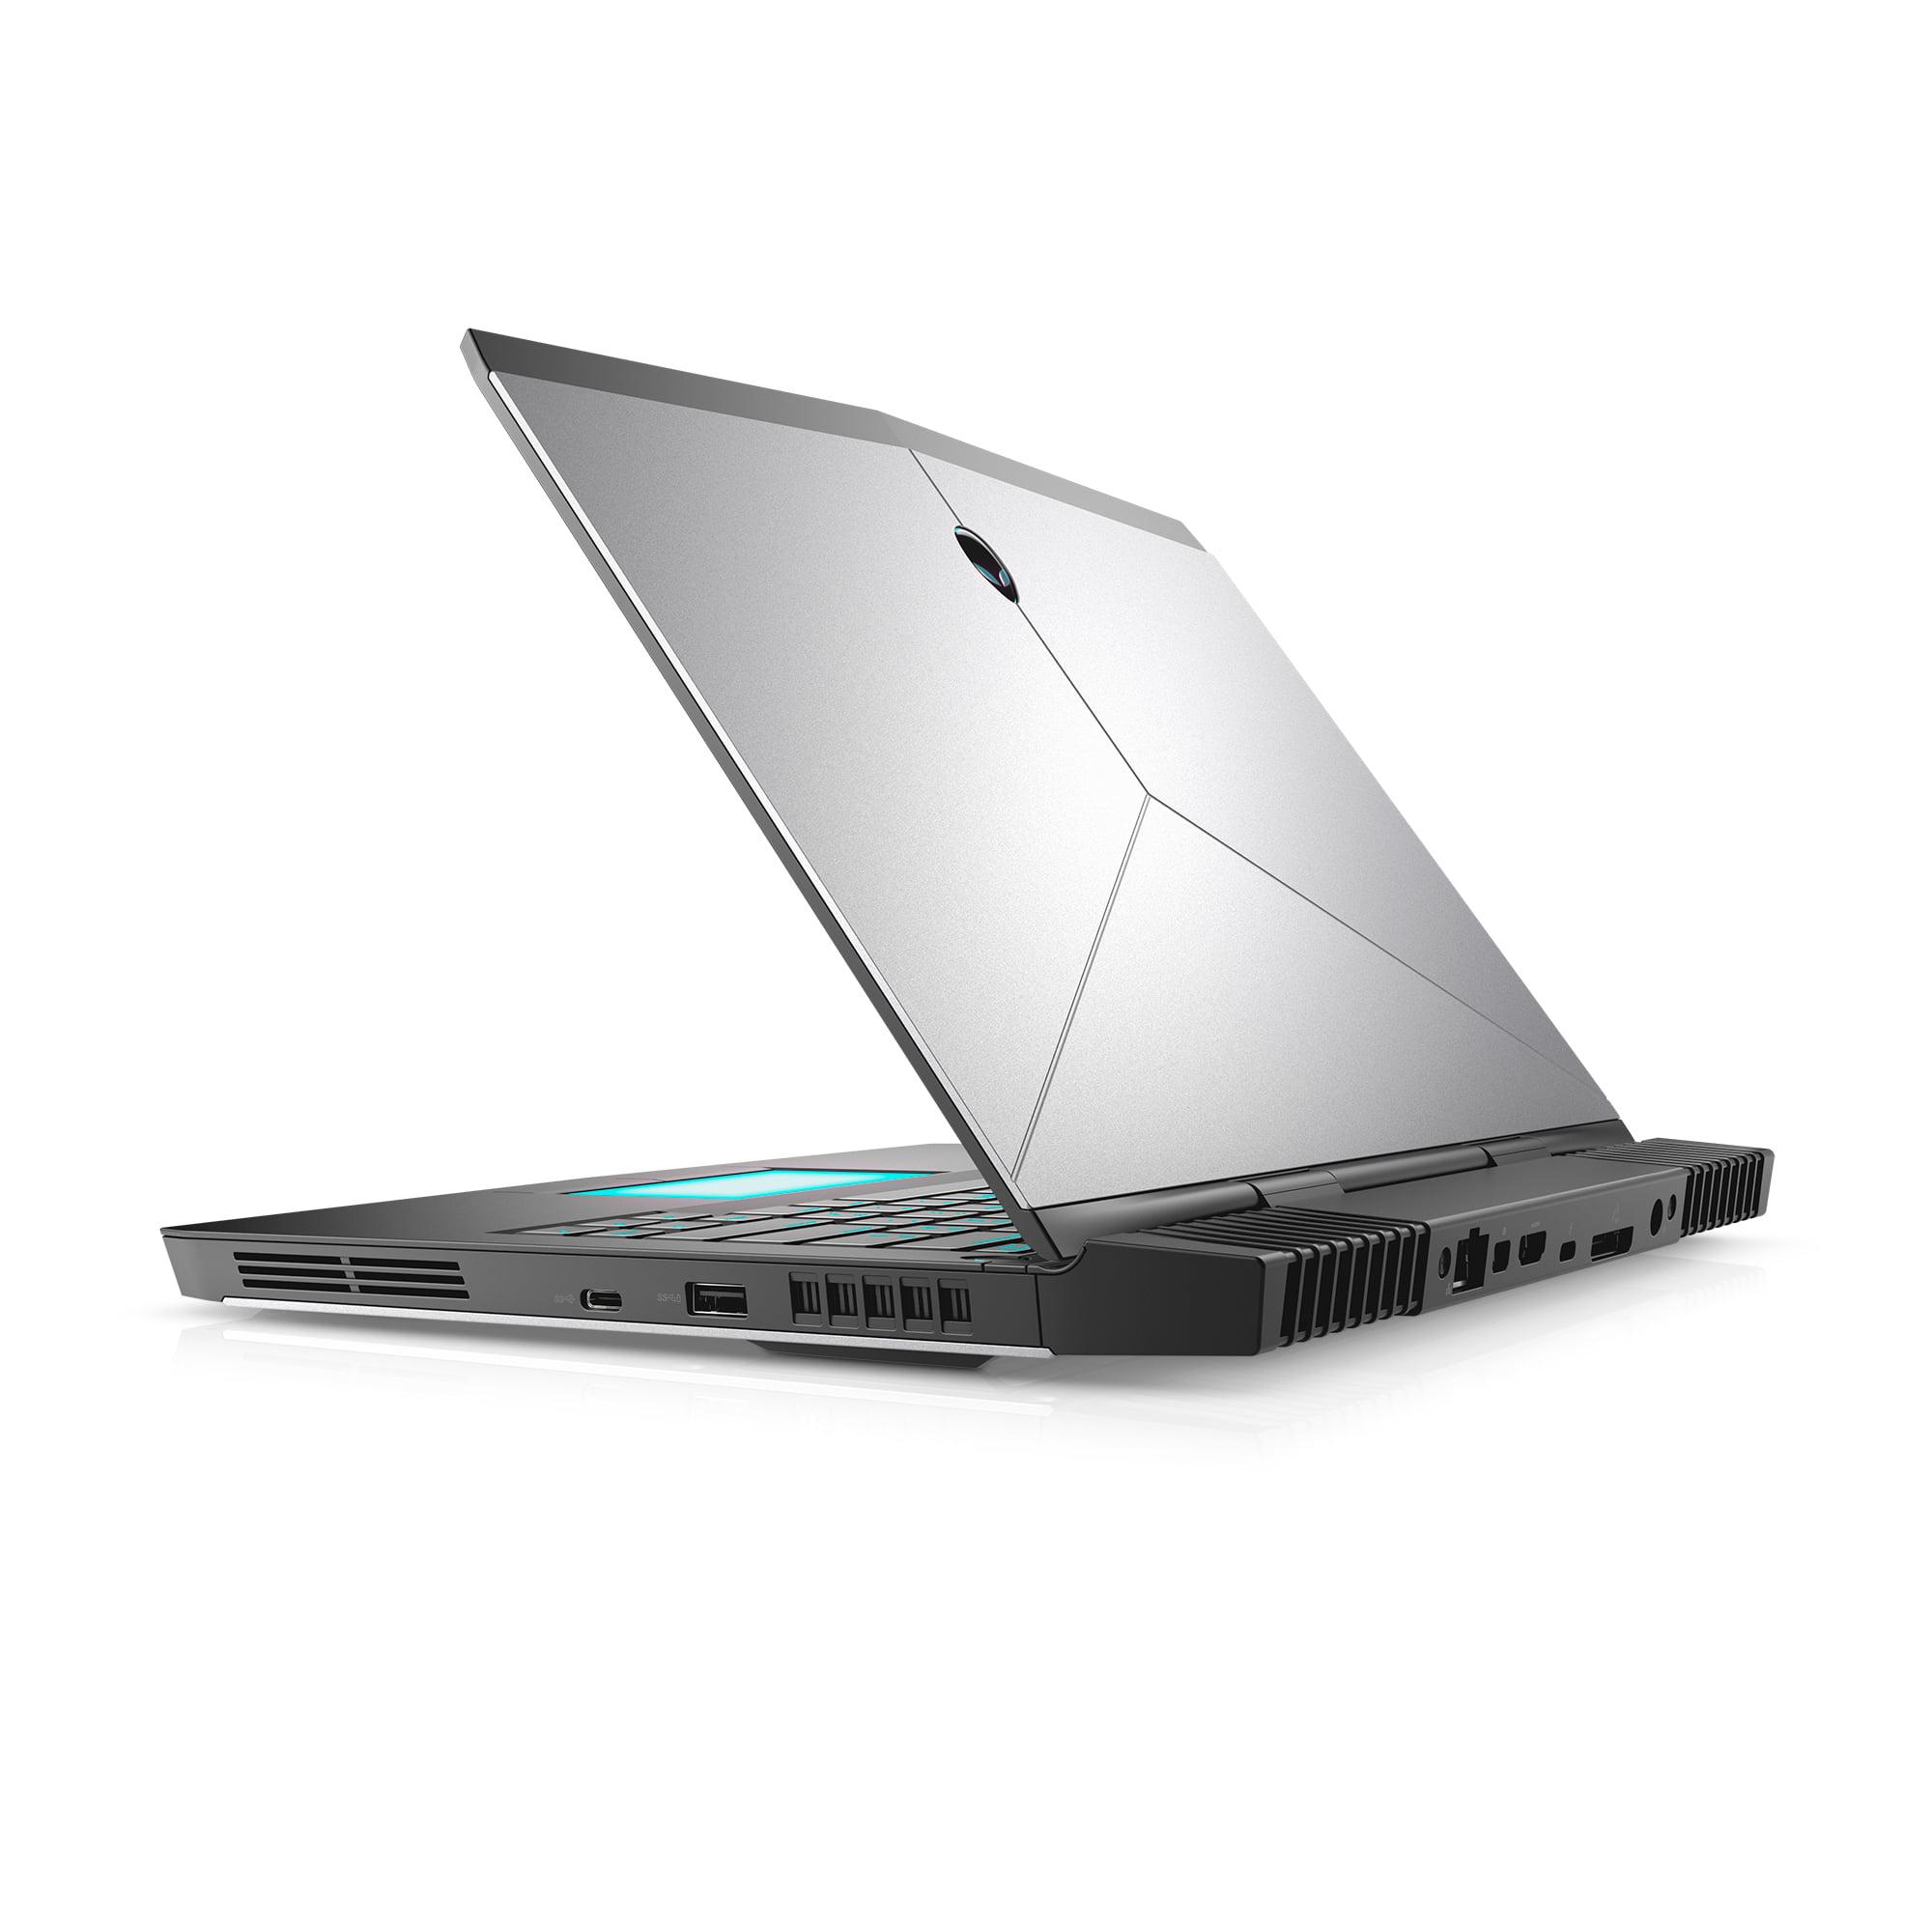 "Dell Alienware 15.6"" FHD Screen, Intel core i7-7700hq, 3.8GHZ, Nvidia GeForce QTX 1060 6GB GDDR5 Graphic Card, 8GB... by Alienware"